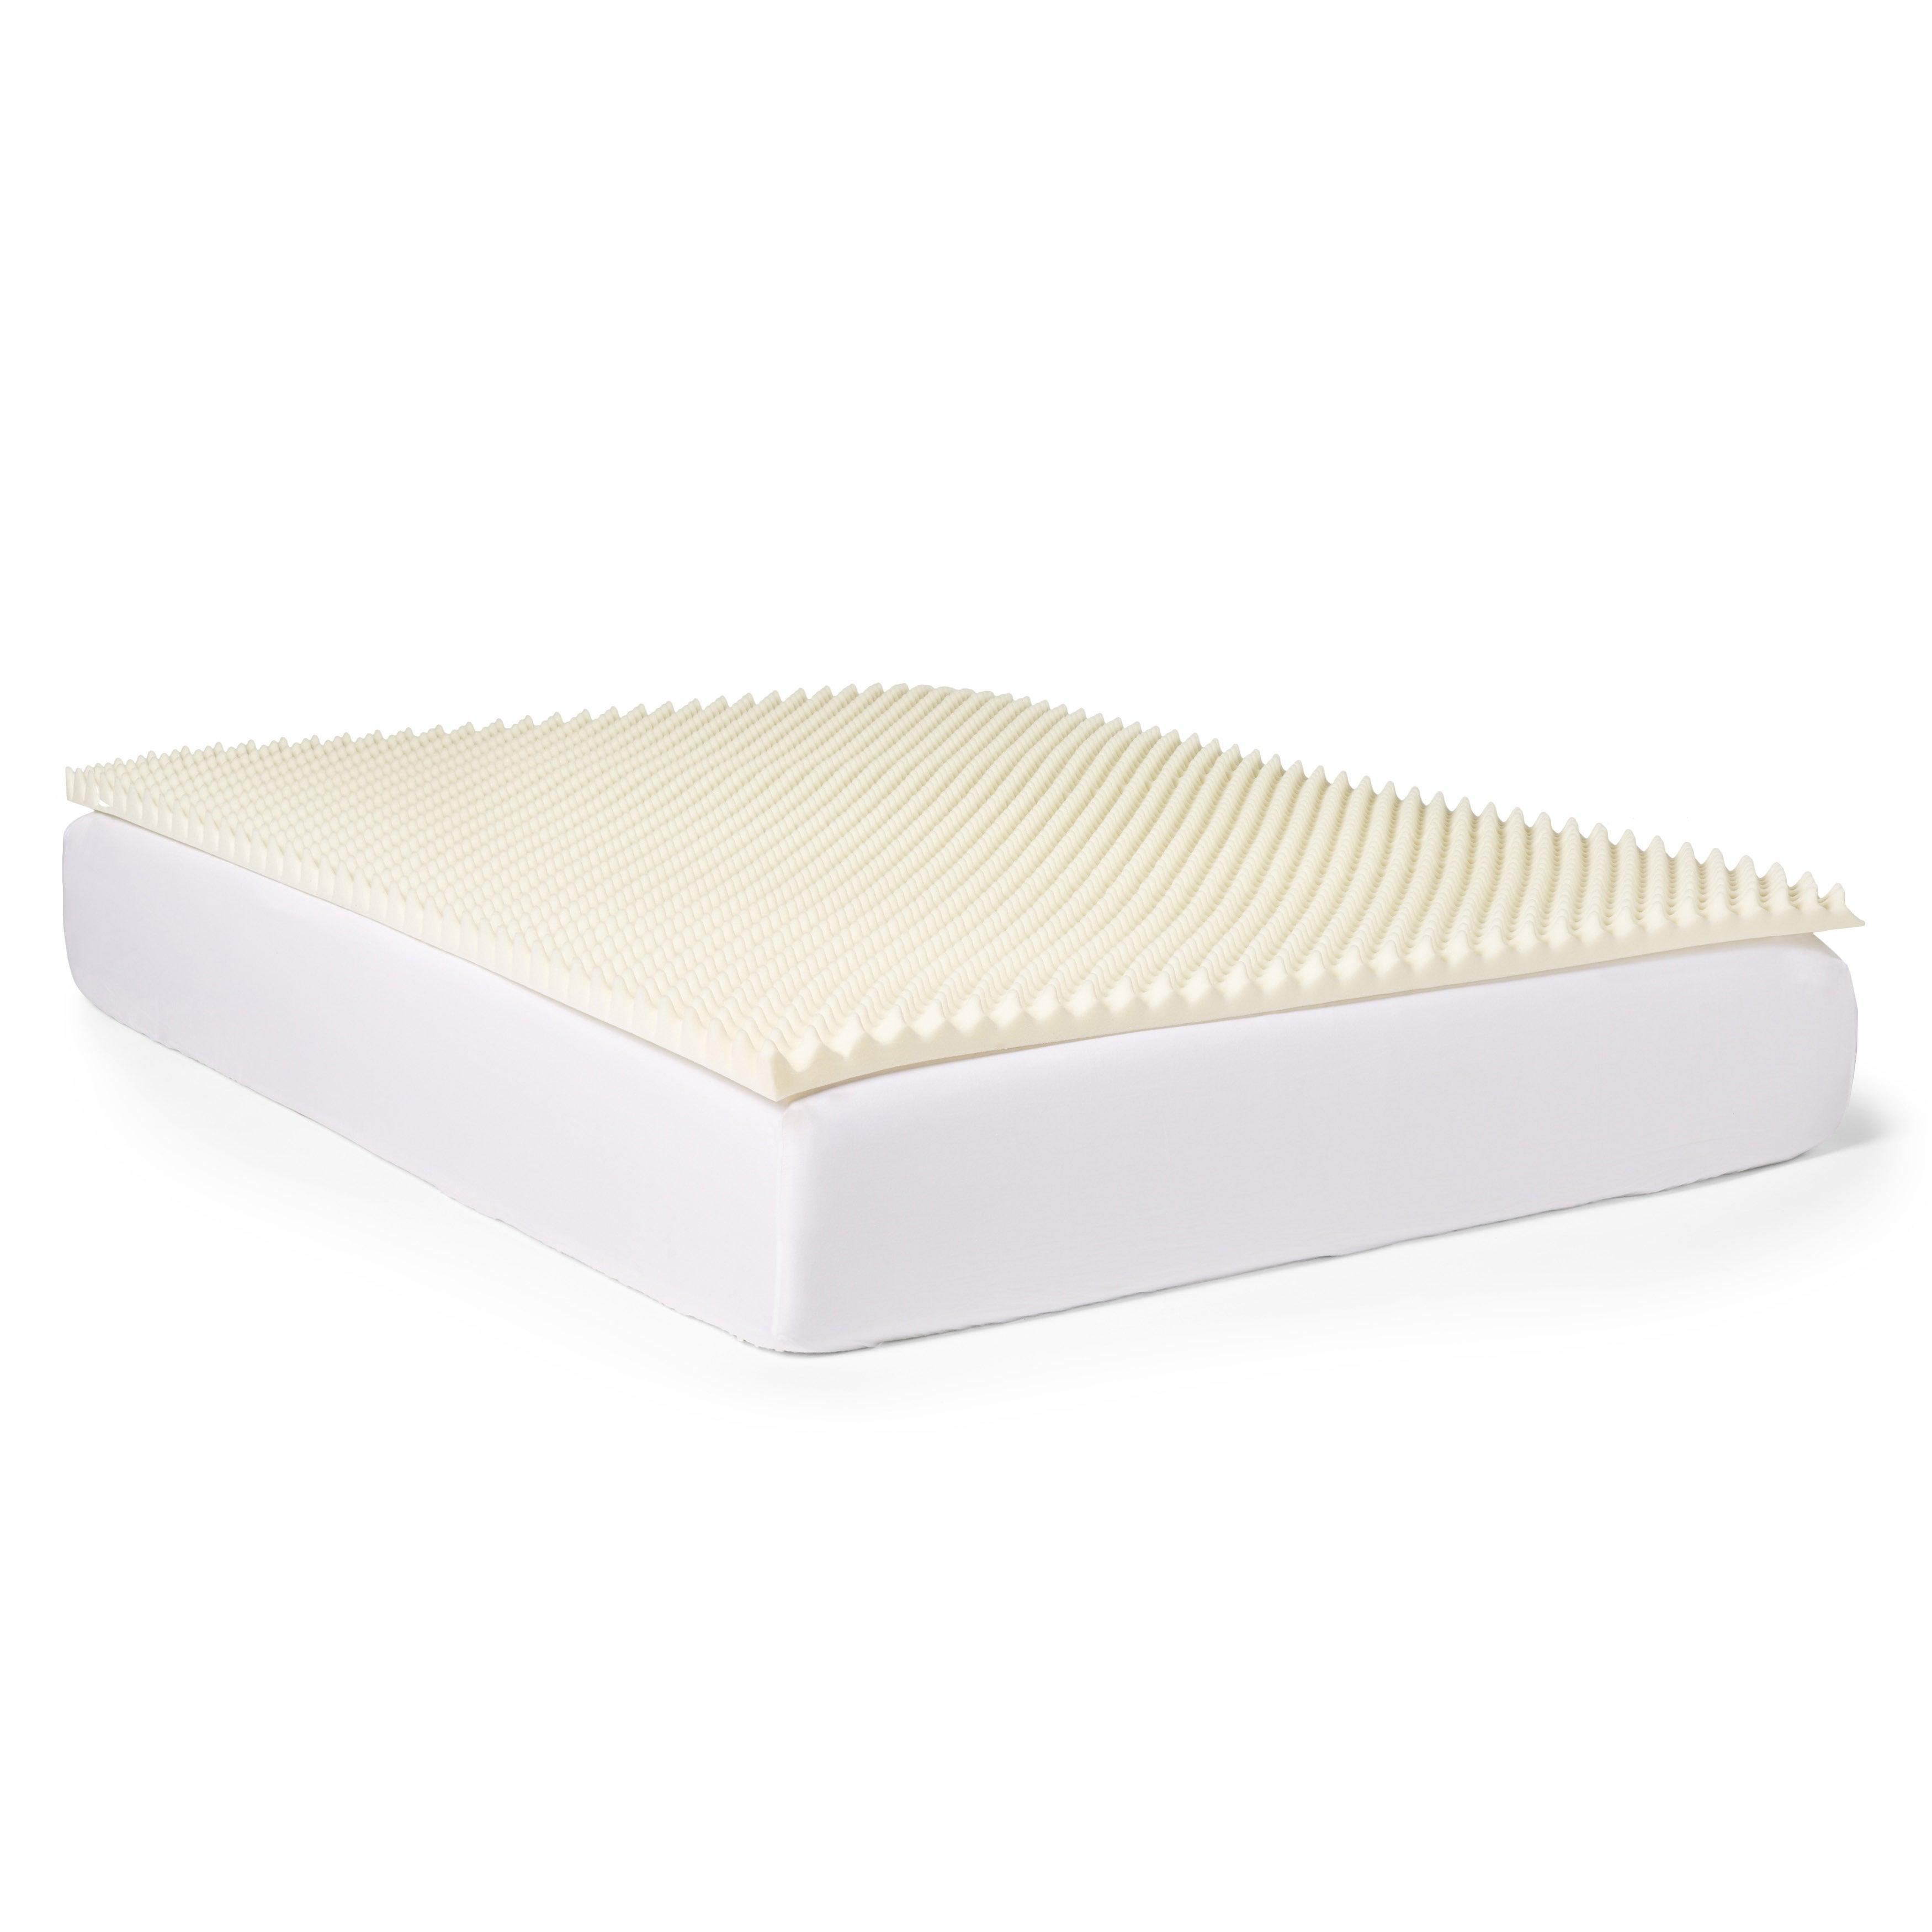 Slumber Solutions Highloft Supreme 2 Inch Memory Foam Mattress